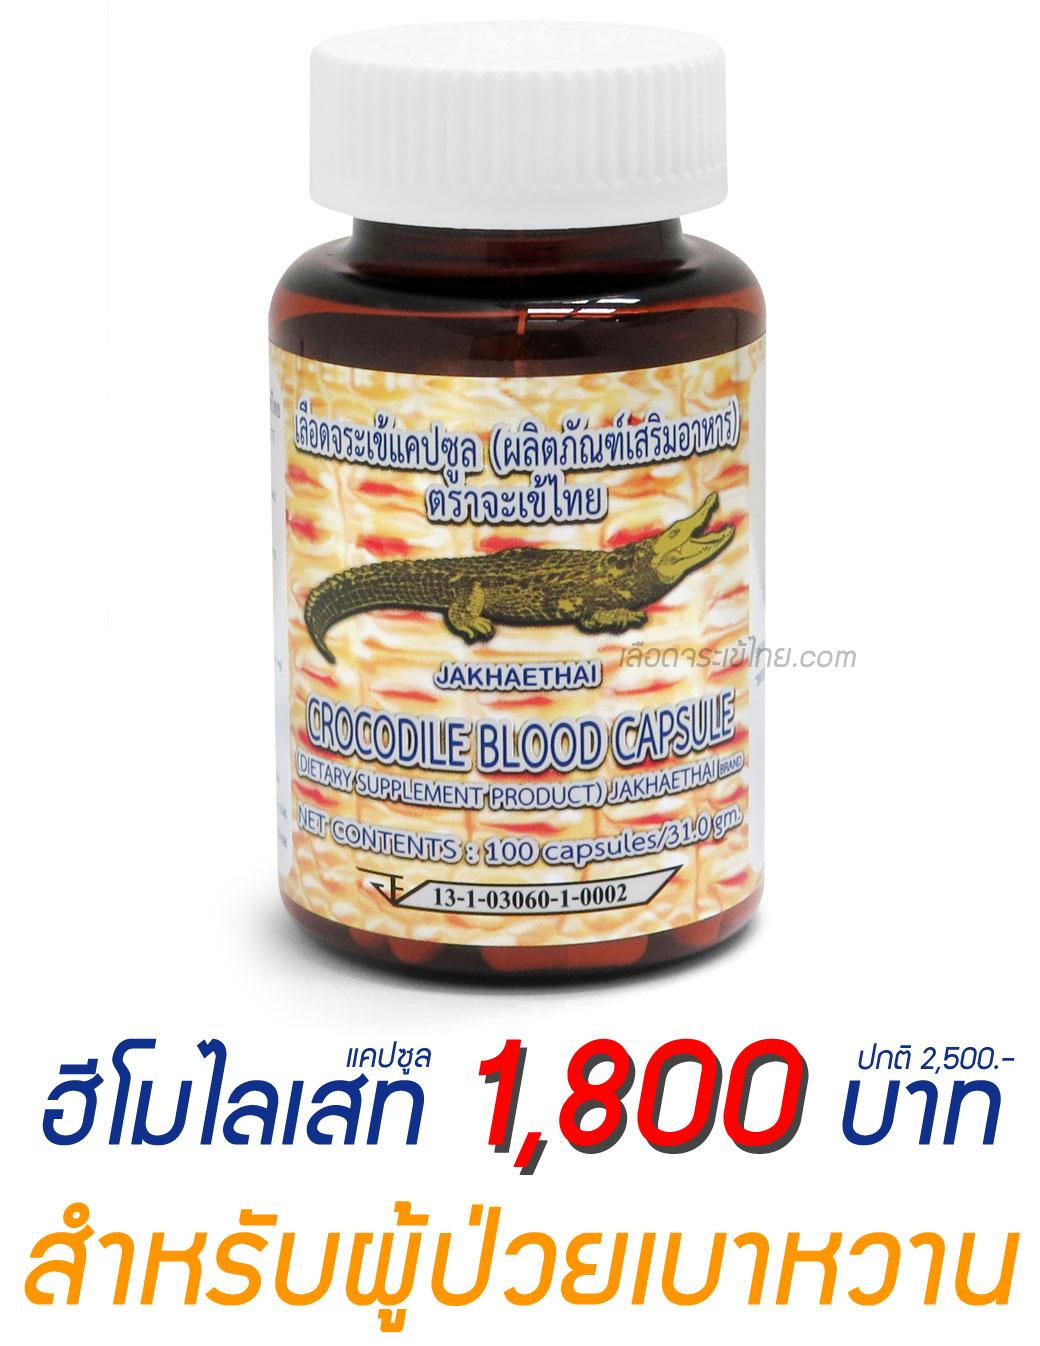 hemolysate-ฮีโมไลเสท-จระเข้แคปซูล-ราคา-1800